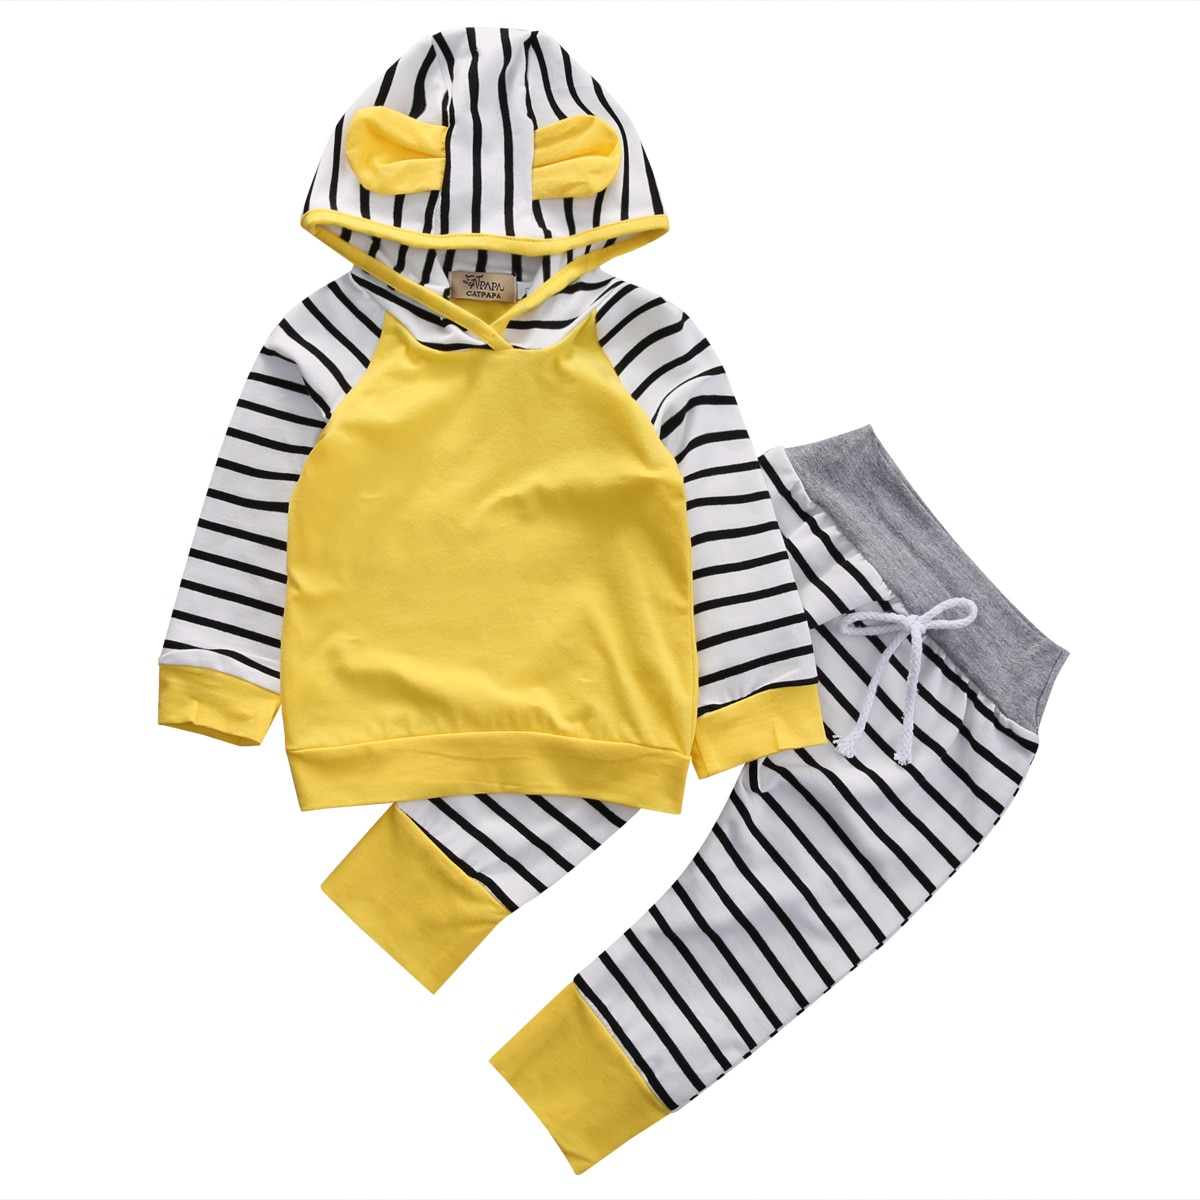 Newborn Baby Boys Girls Romper Hooded Sweatshirt Pants Striped Long Sleeve hoodie Infant kids Fall clothes